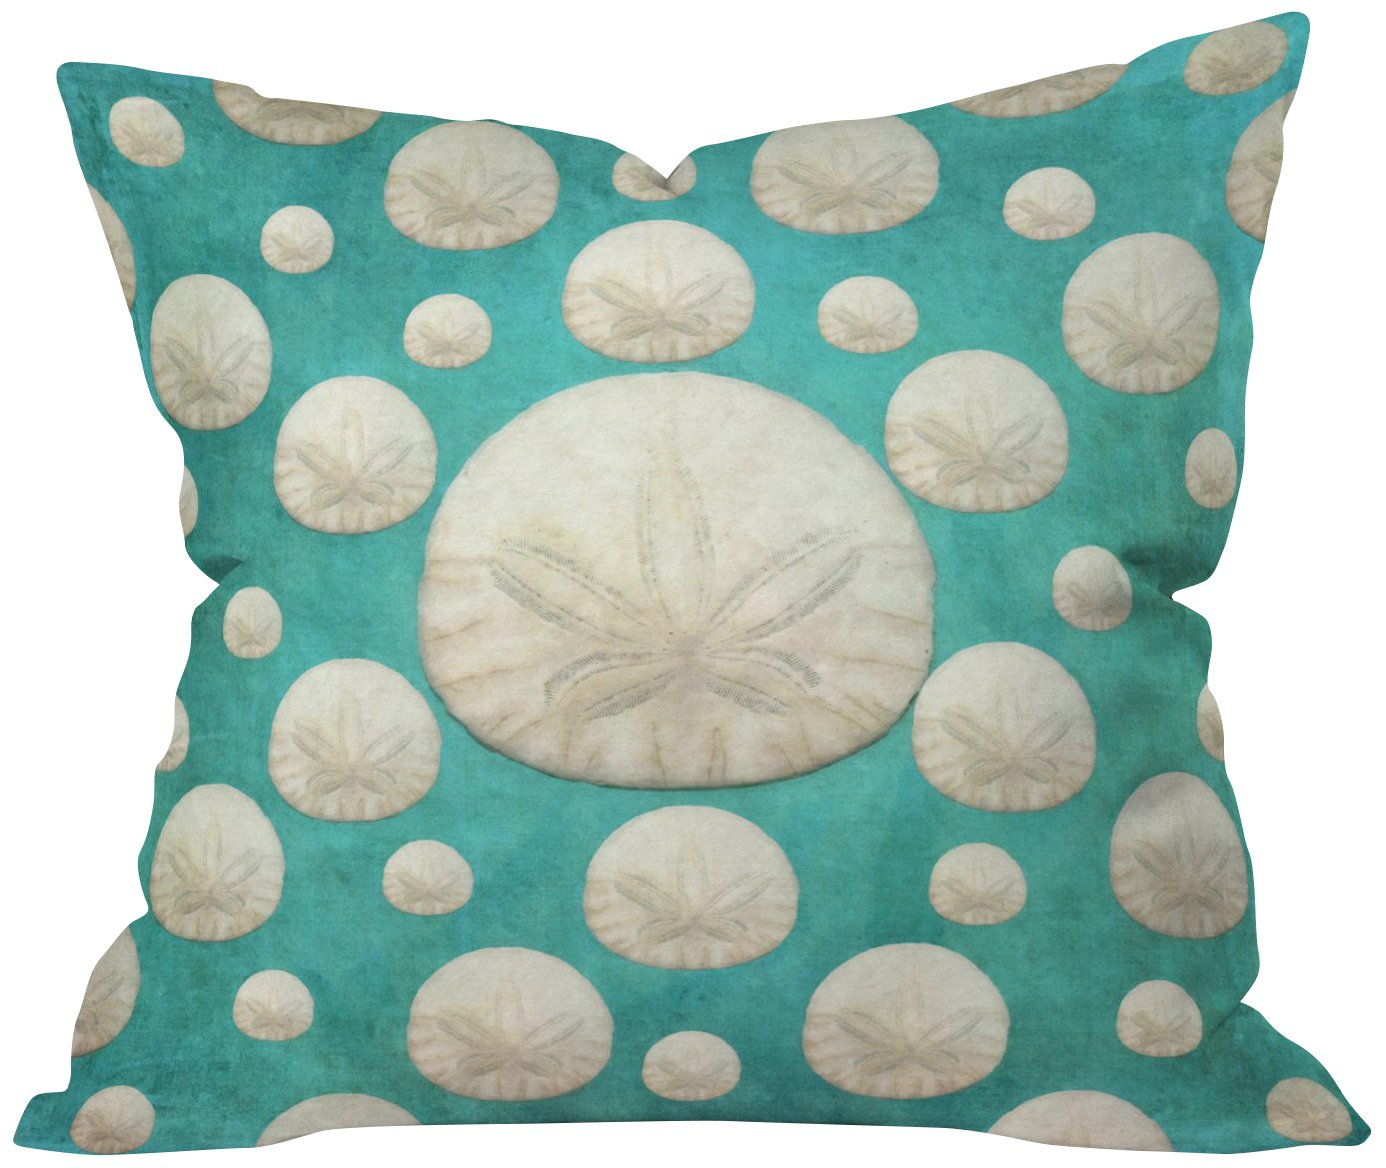 NIP Standard LakeSide Living Pillowcase Set 300 Thread Count BlueTan White Plaid